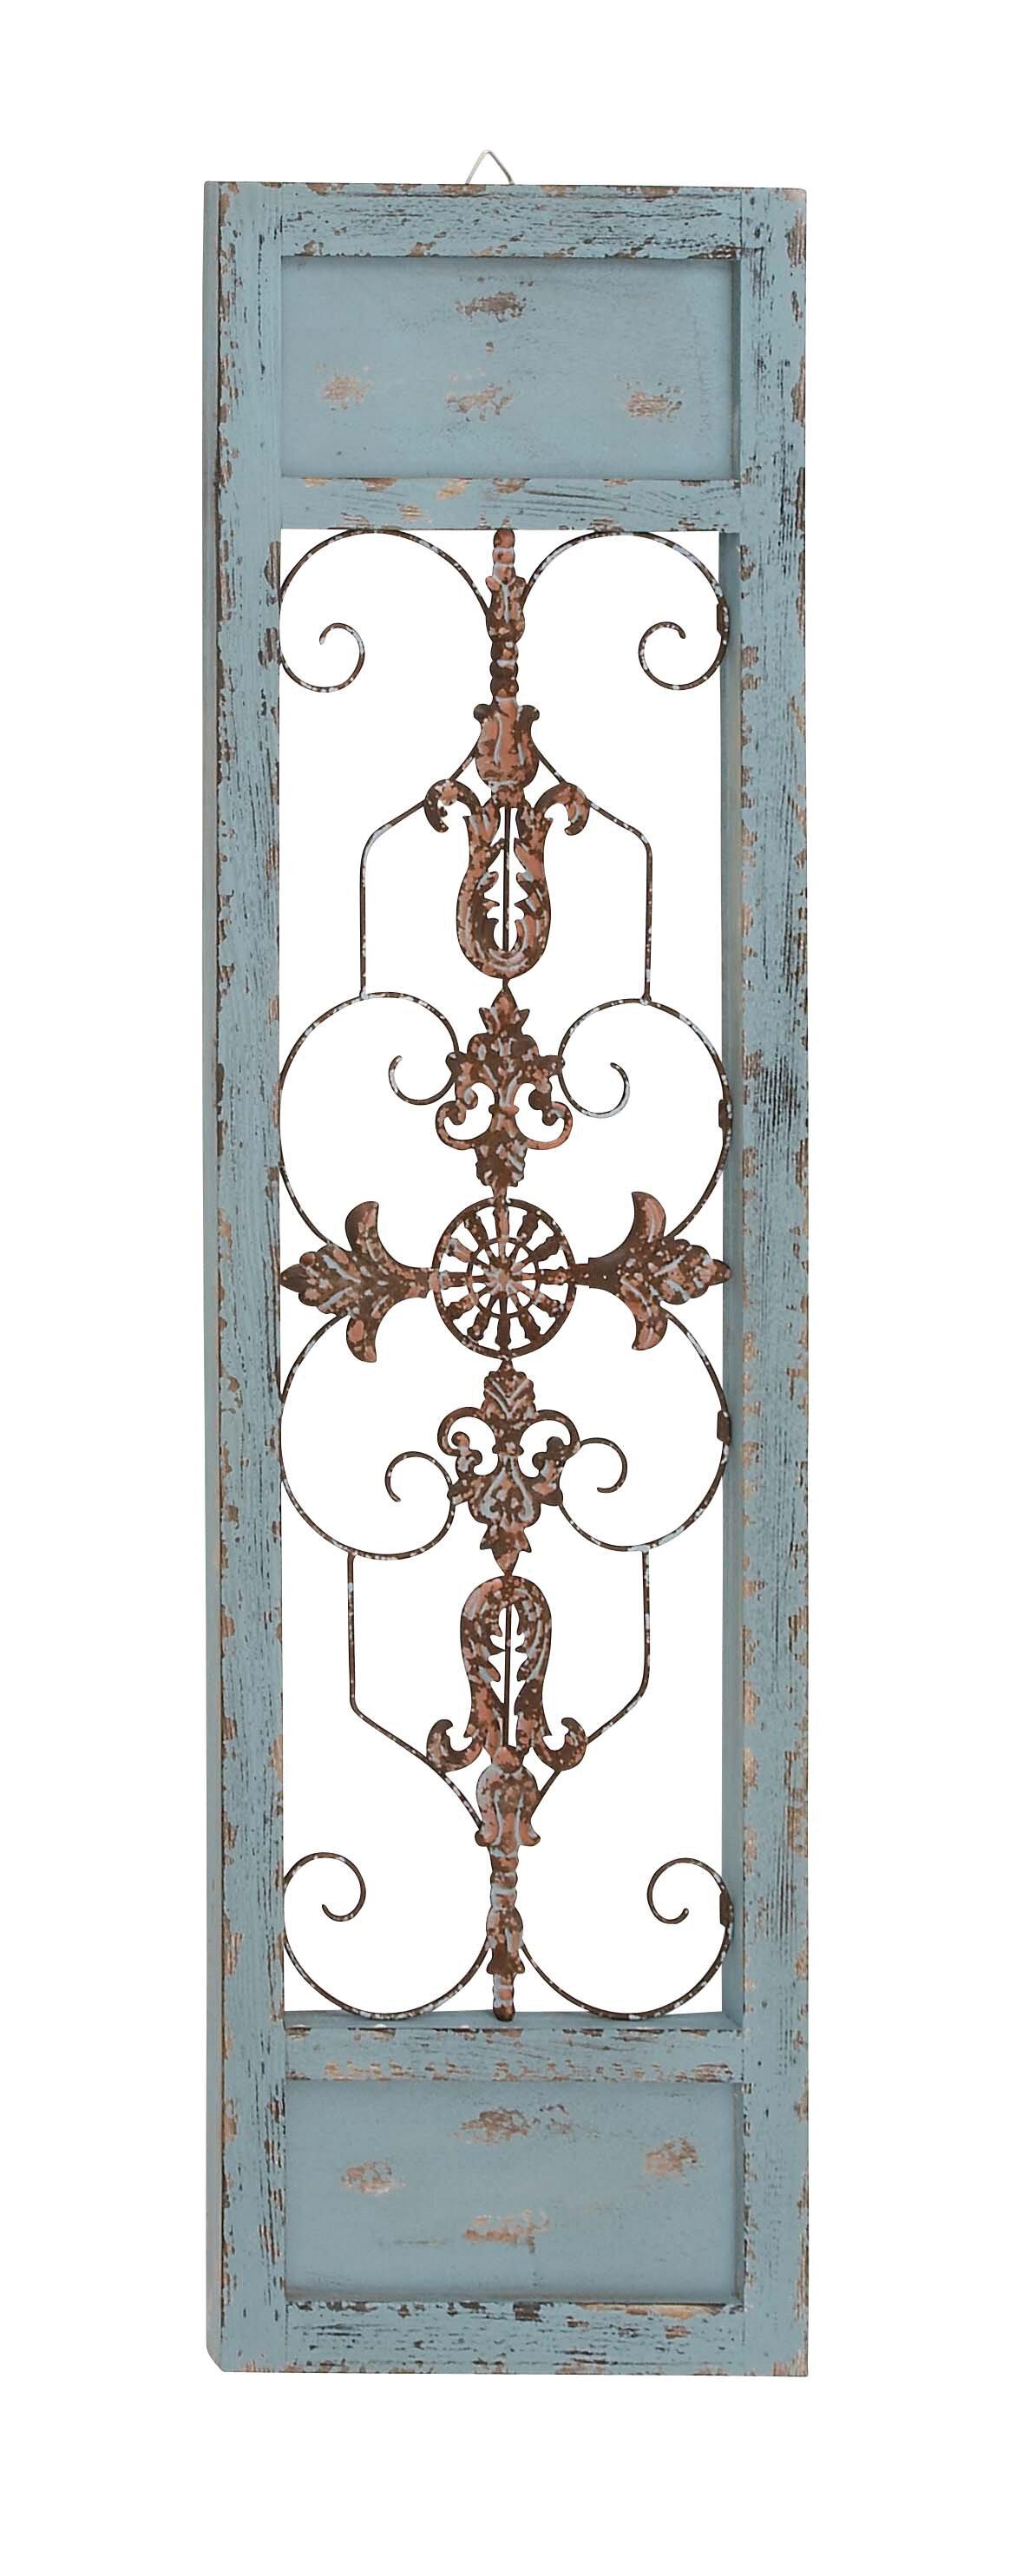 Ornamental Wood And Metal Scroll Wall Decor